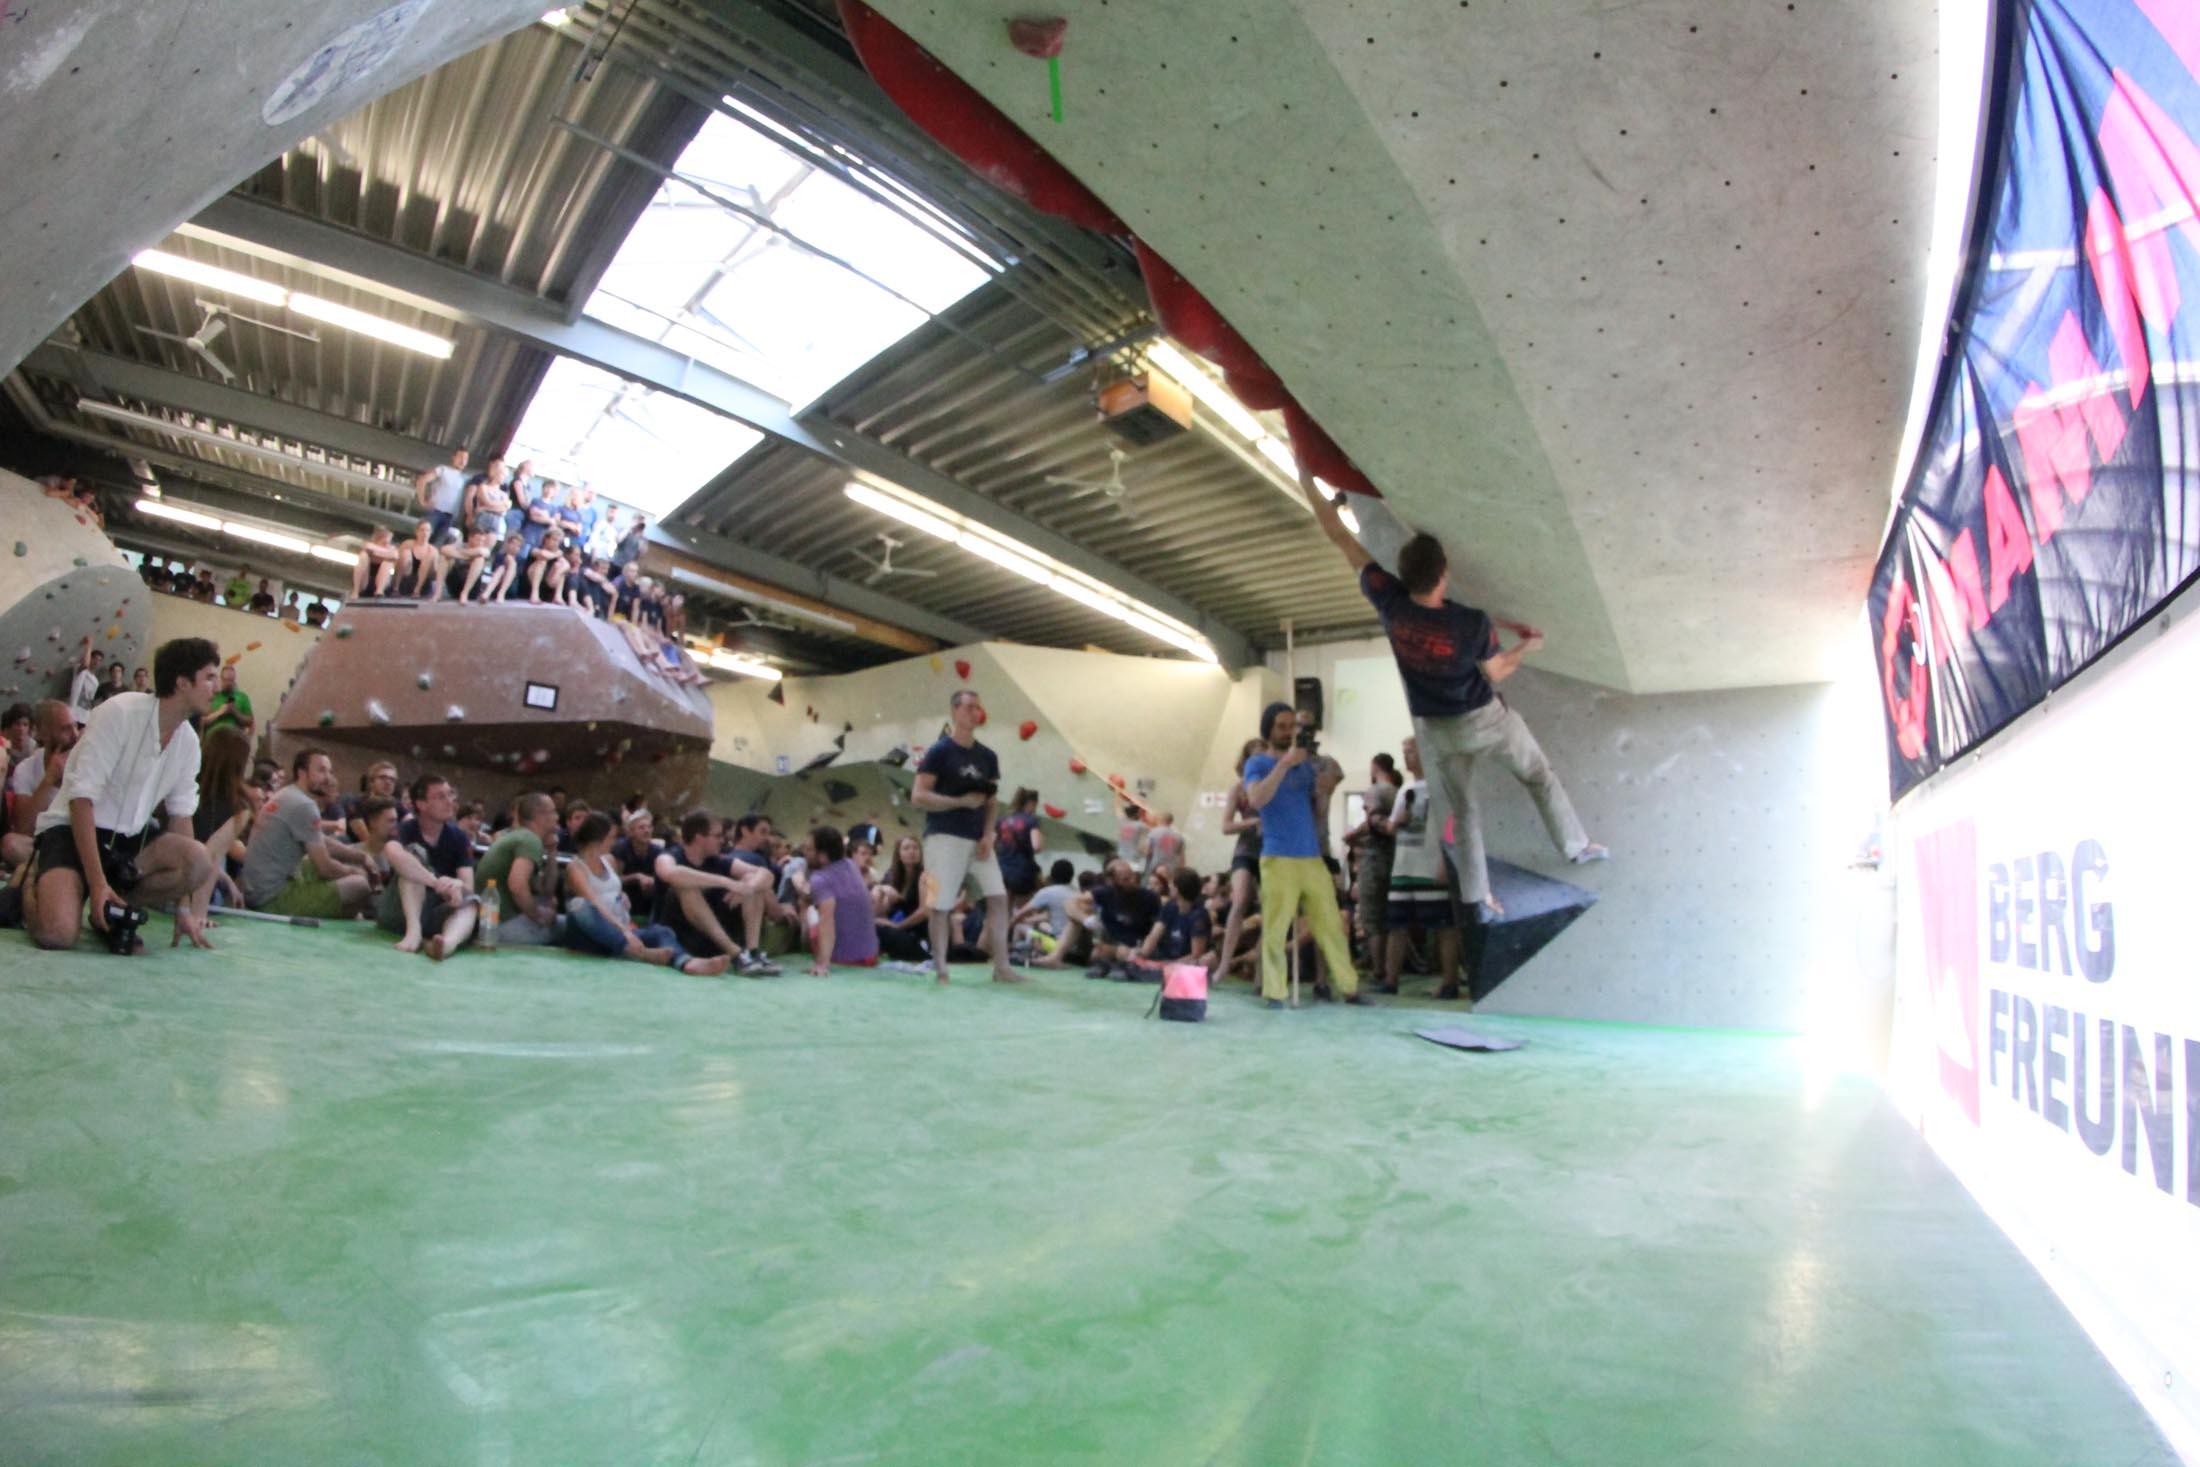 Finale, internationaler bouldercup Frankenjura 2016, BLOCKHELDEN Erlangen, Mammut, Bergfreunde.de, Boulderwettkampf07092016609